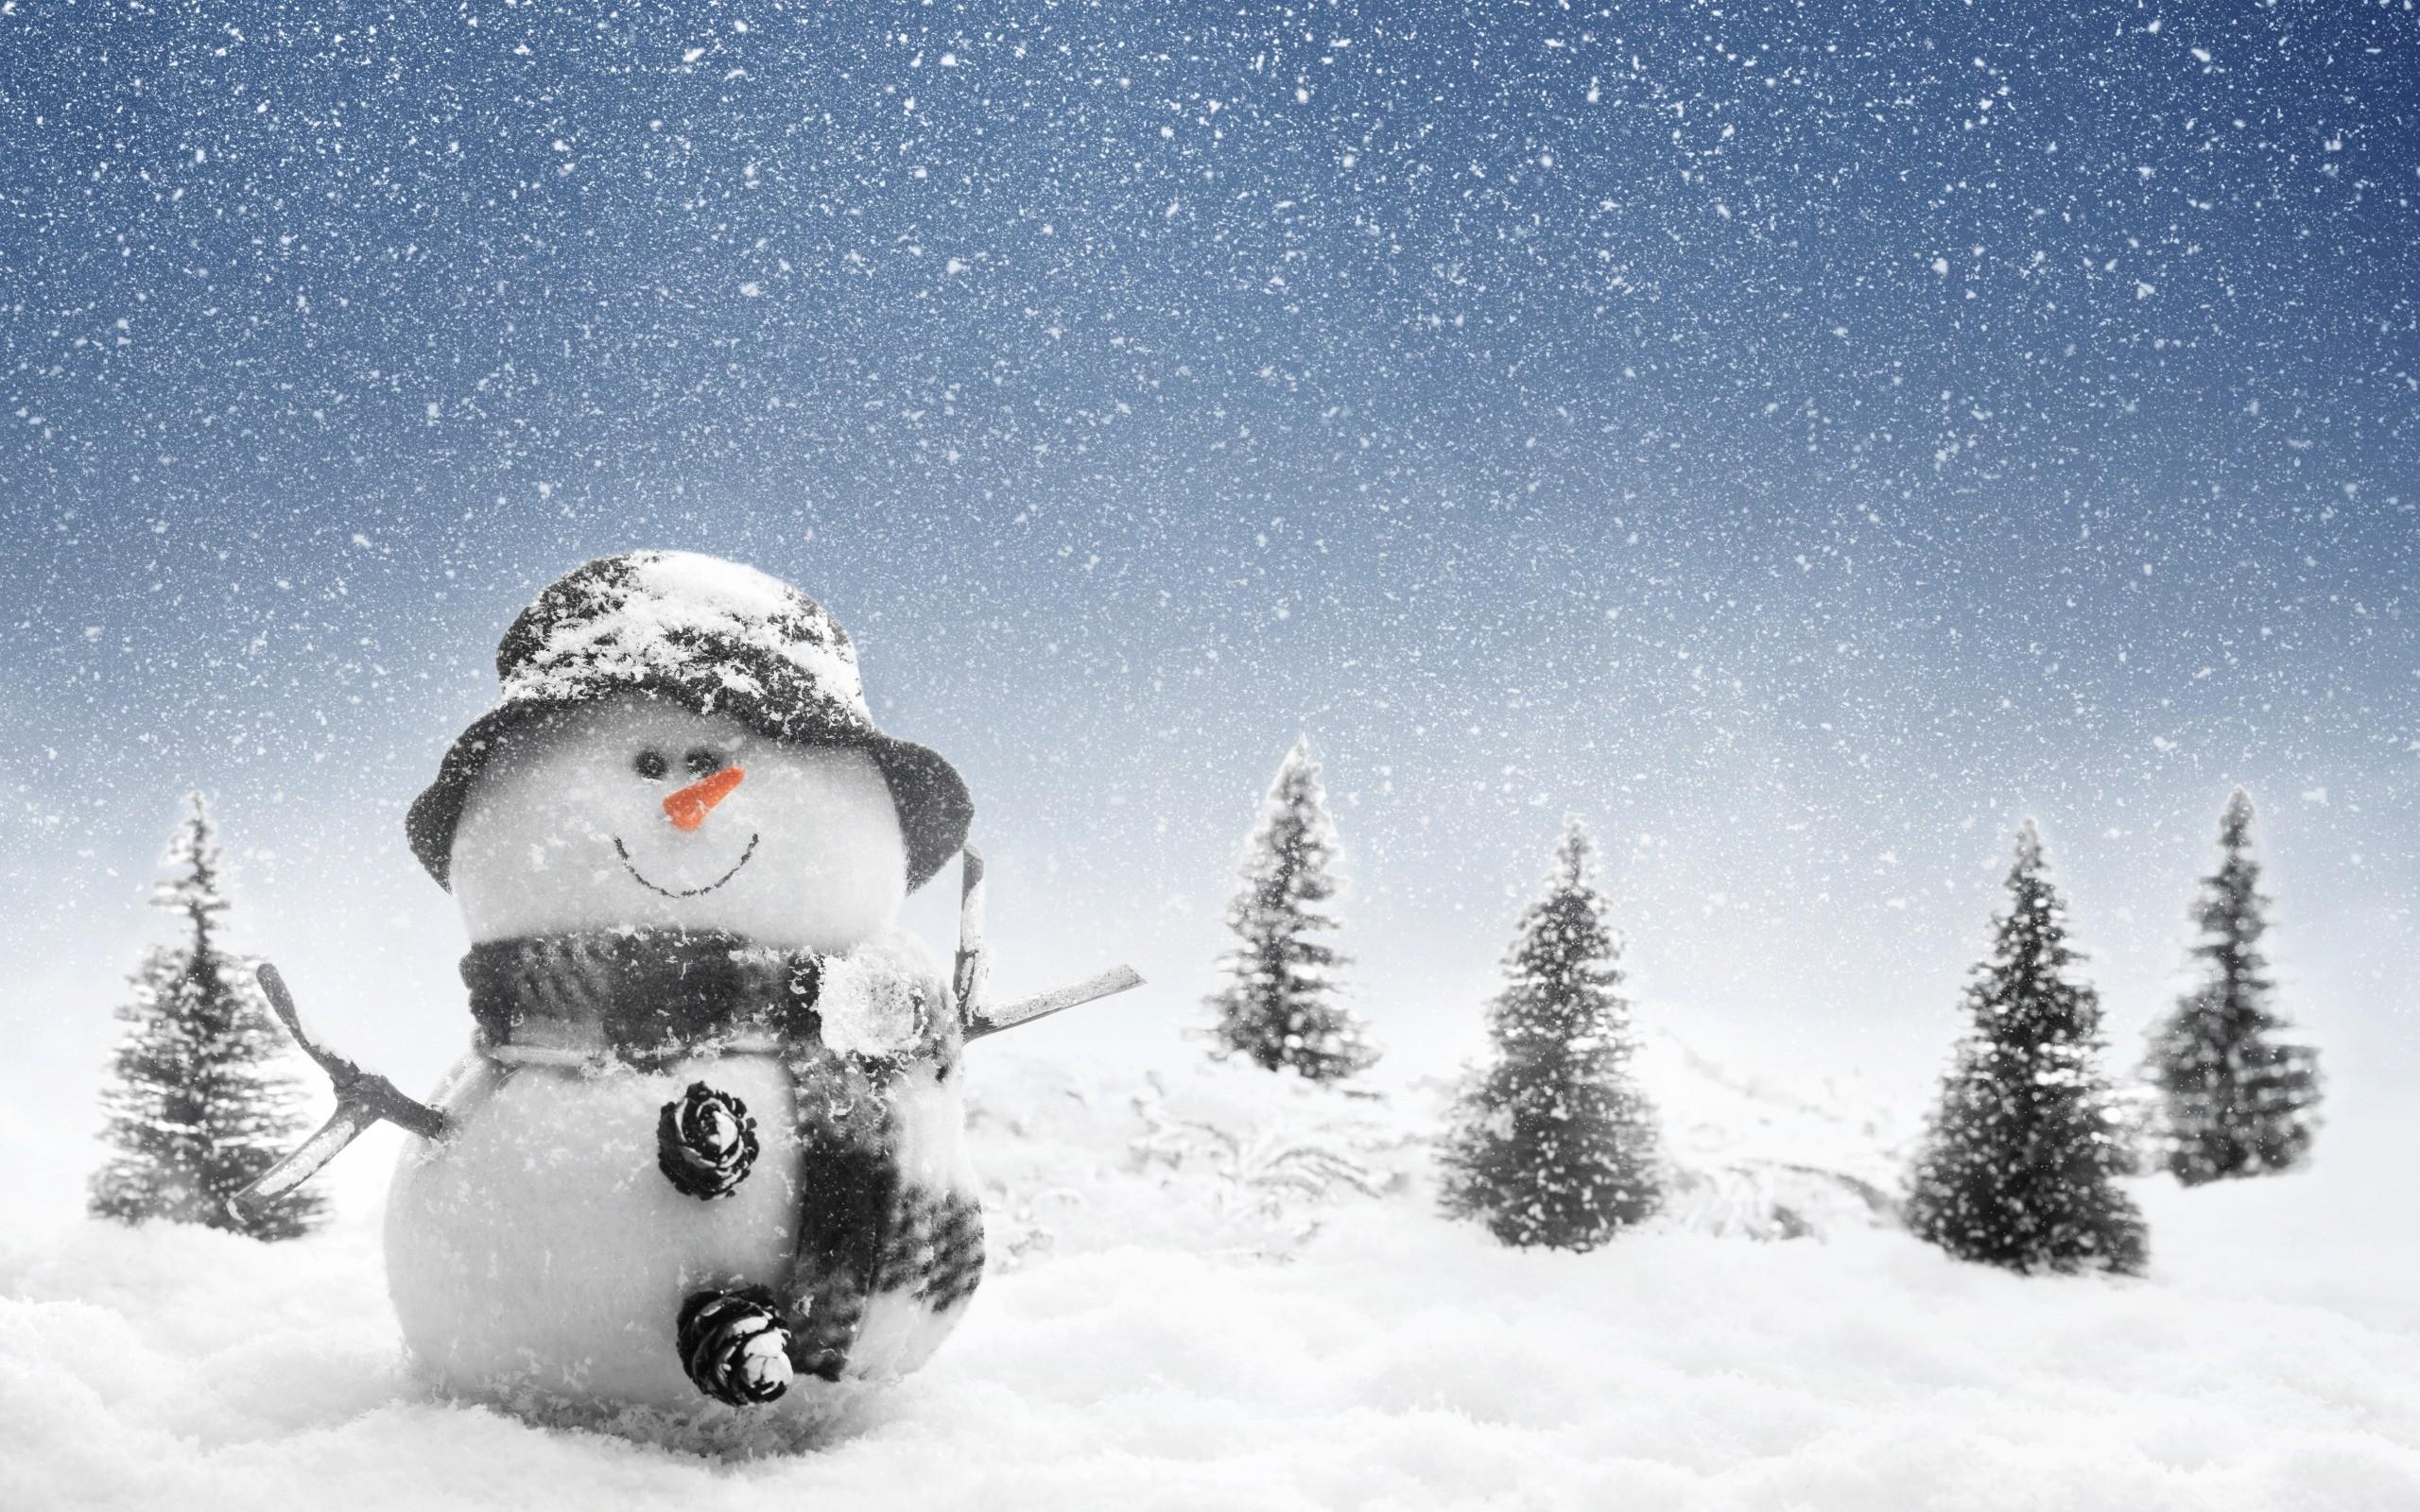 Snowman Wallpaper In Winter photos Free Christmas Snowman Wallpapers